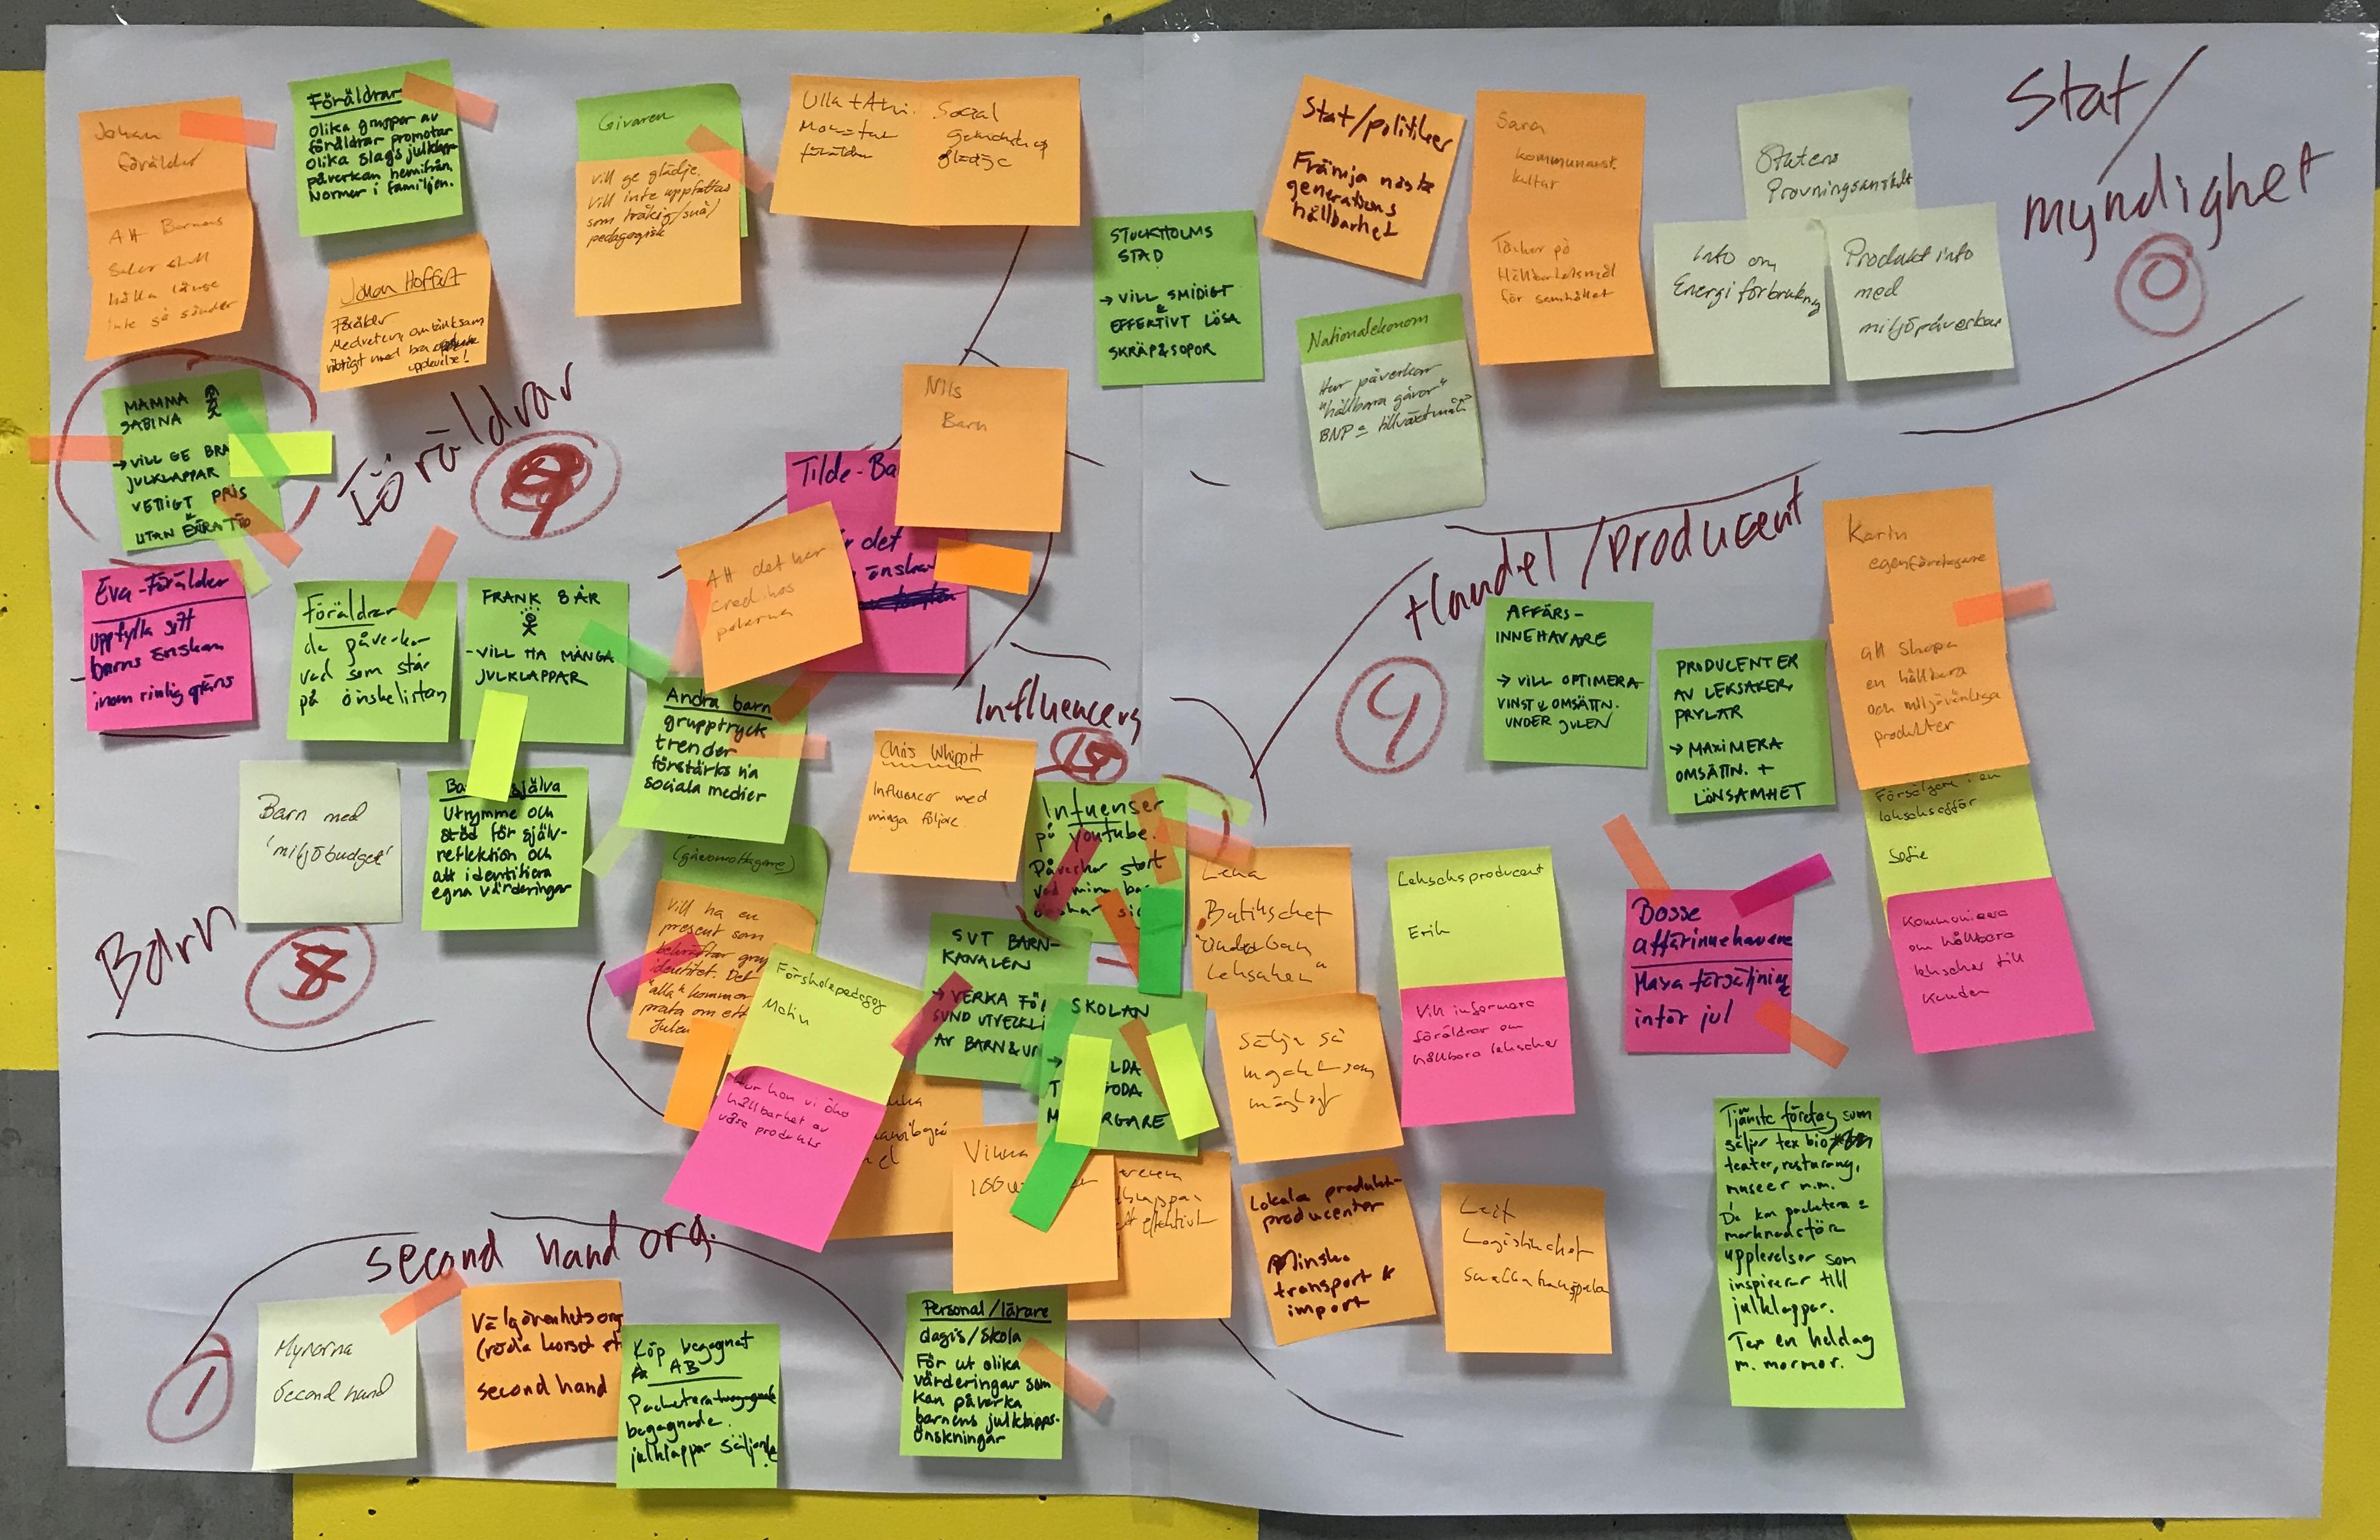 goto10dec14-stakeholdermap